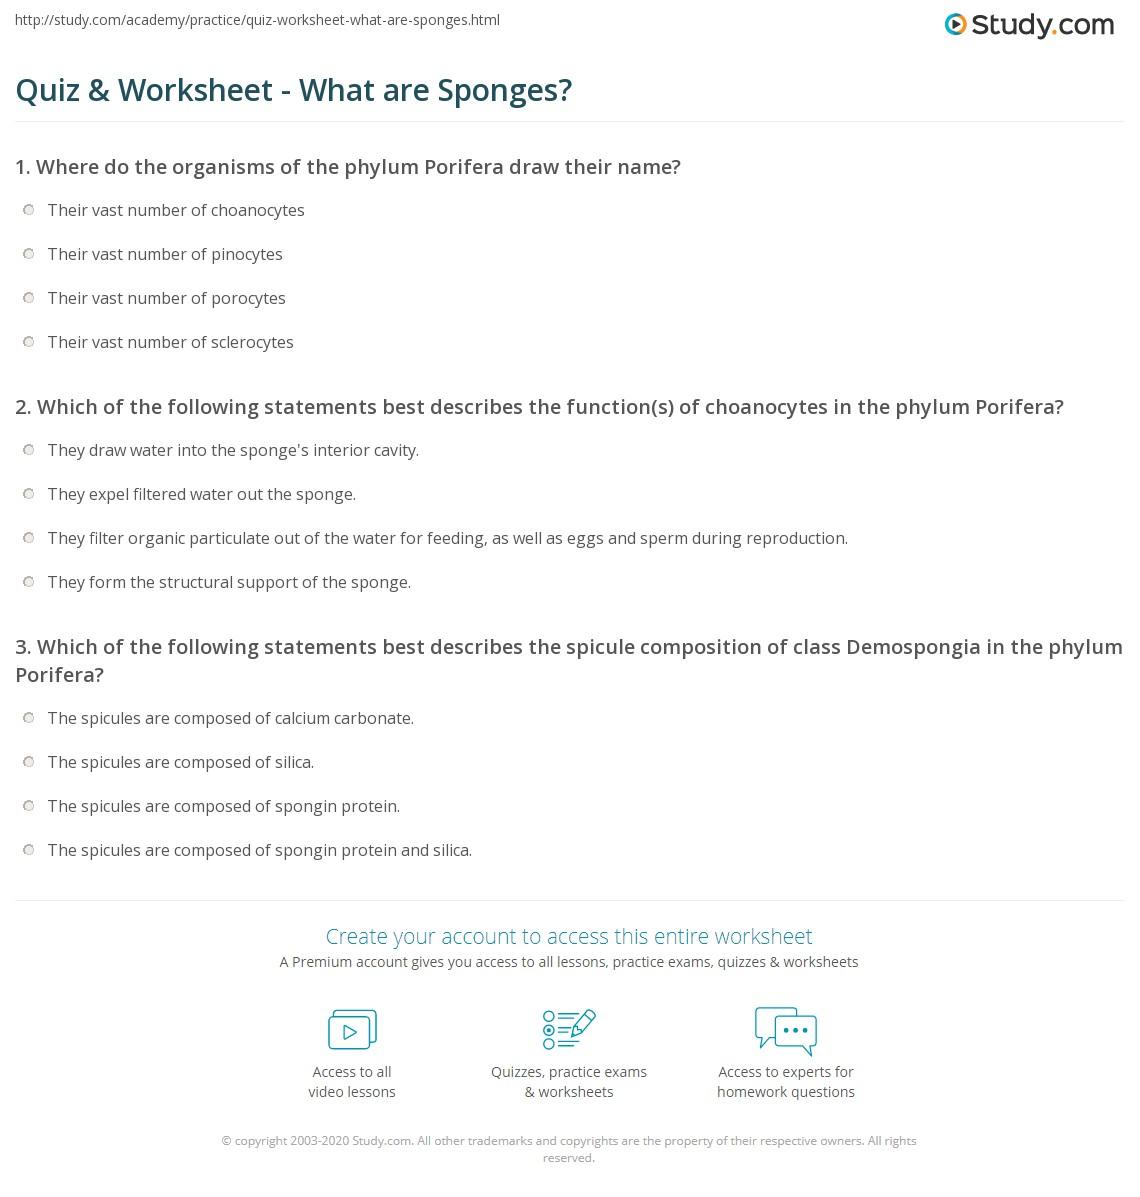 Quiz & Worksheet - What are Sponges? | Study.com